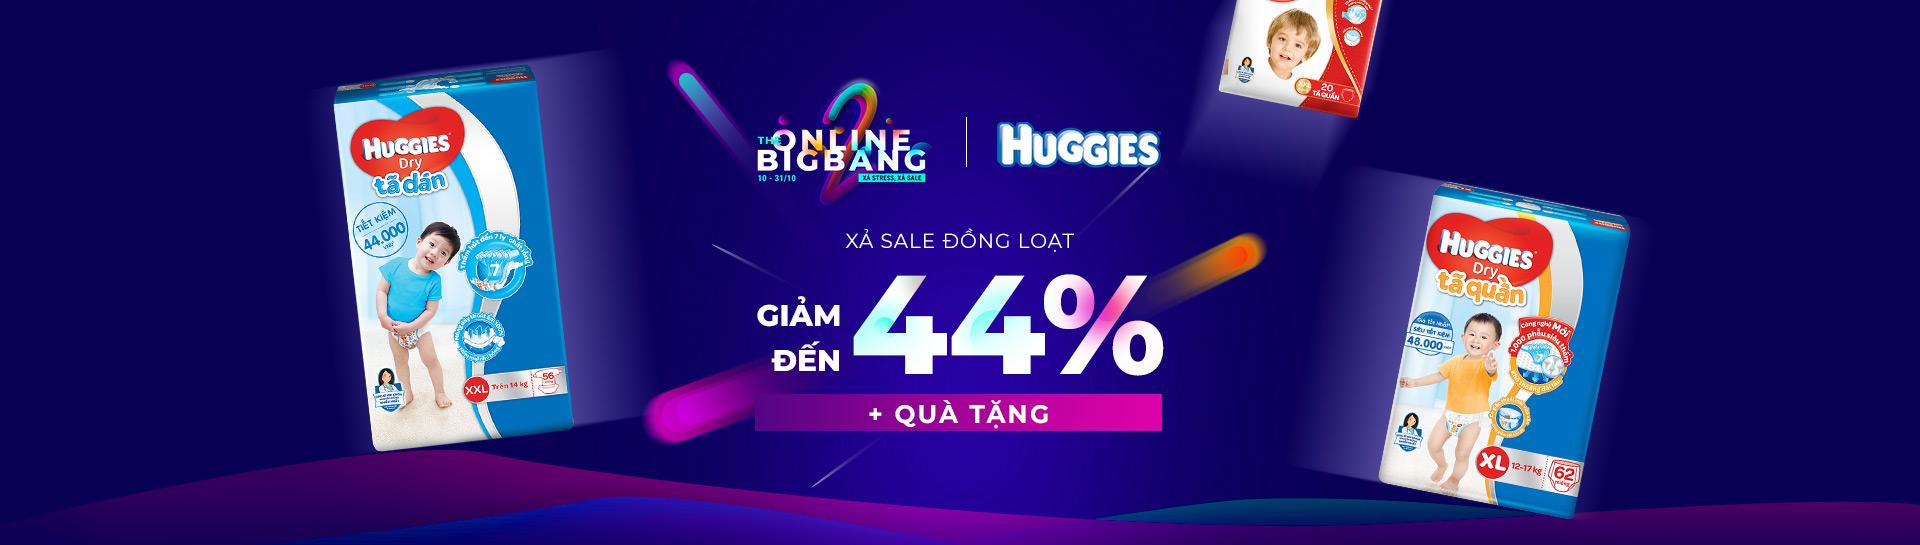 Huggies - giảm đến 44%